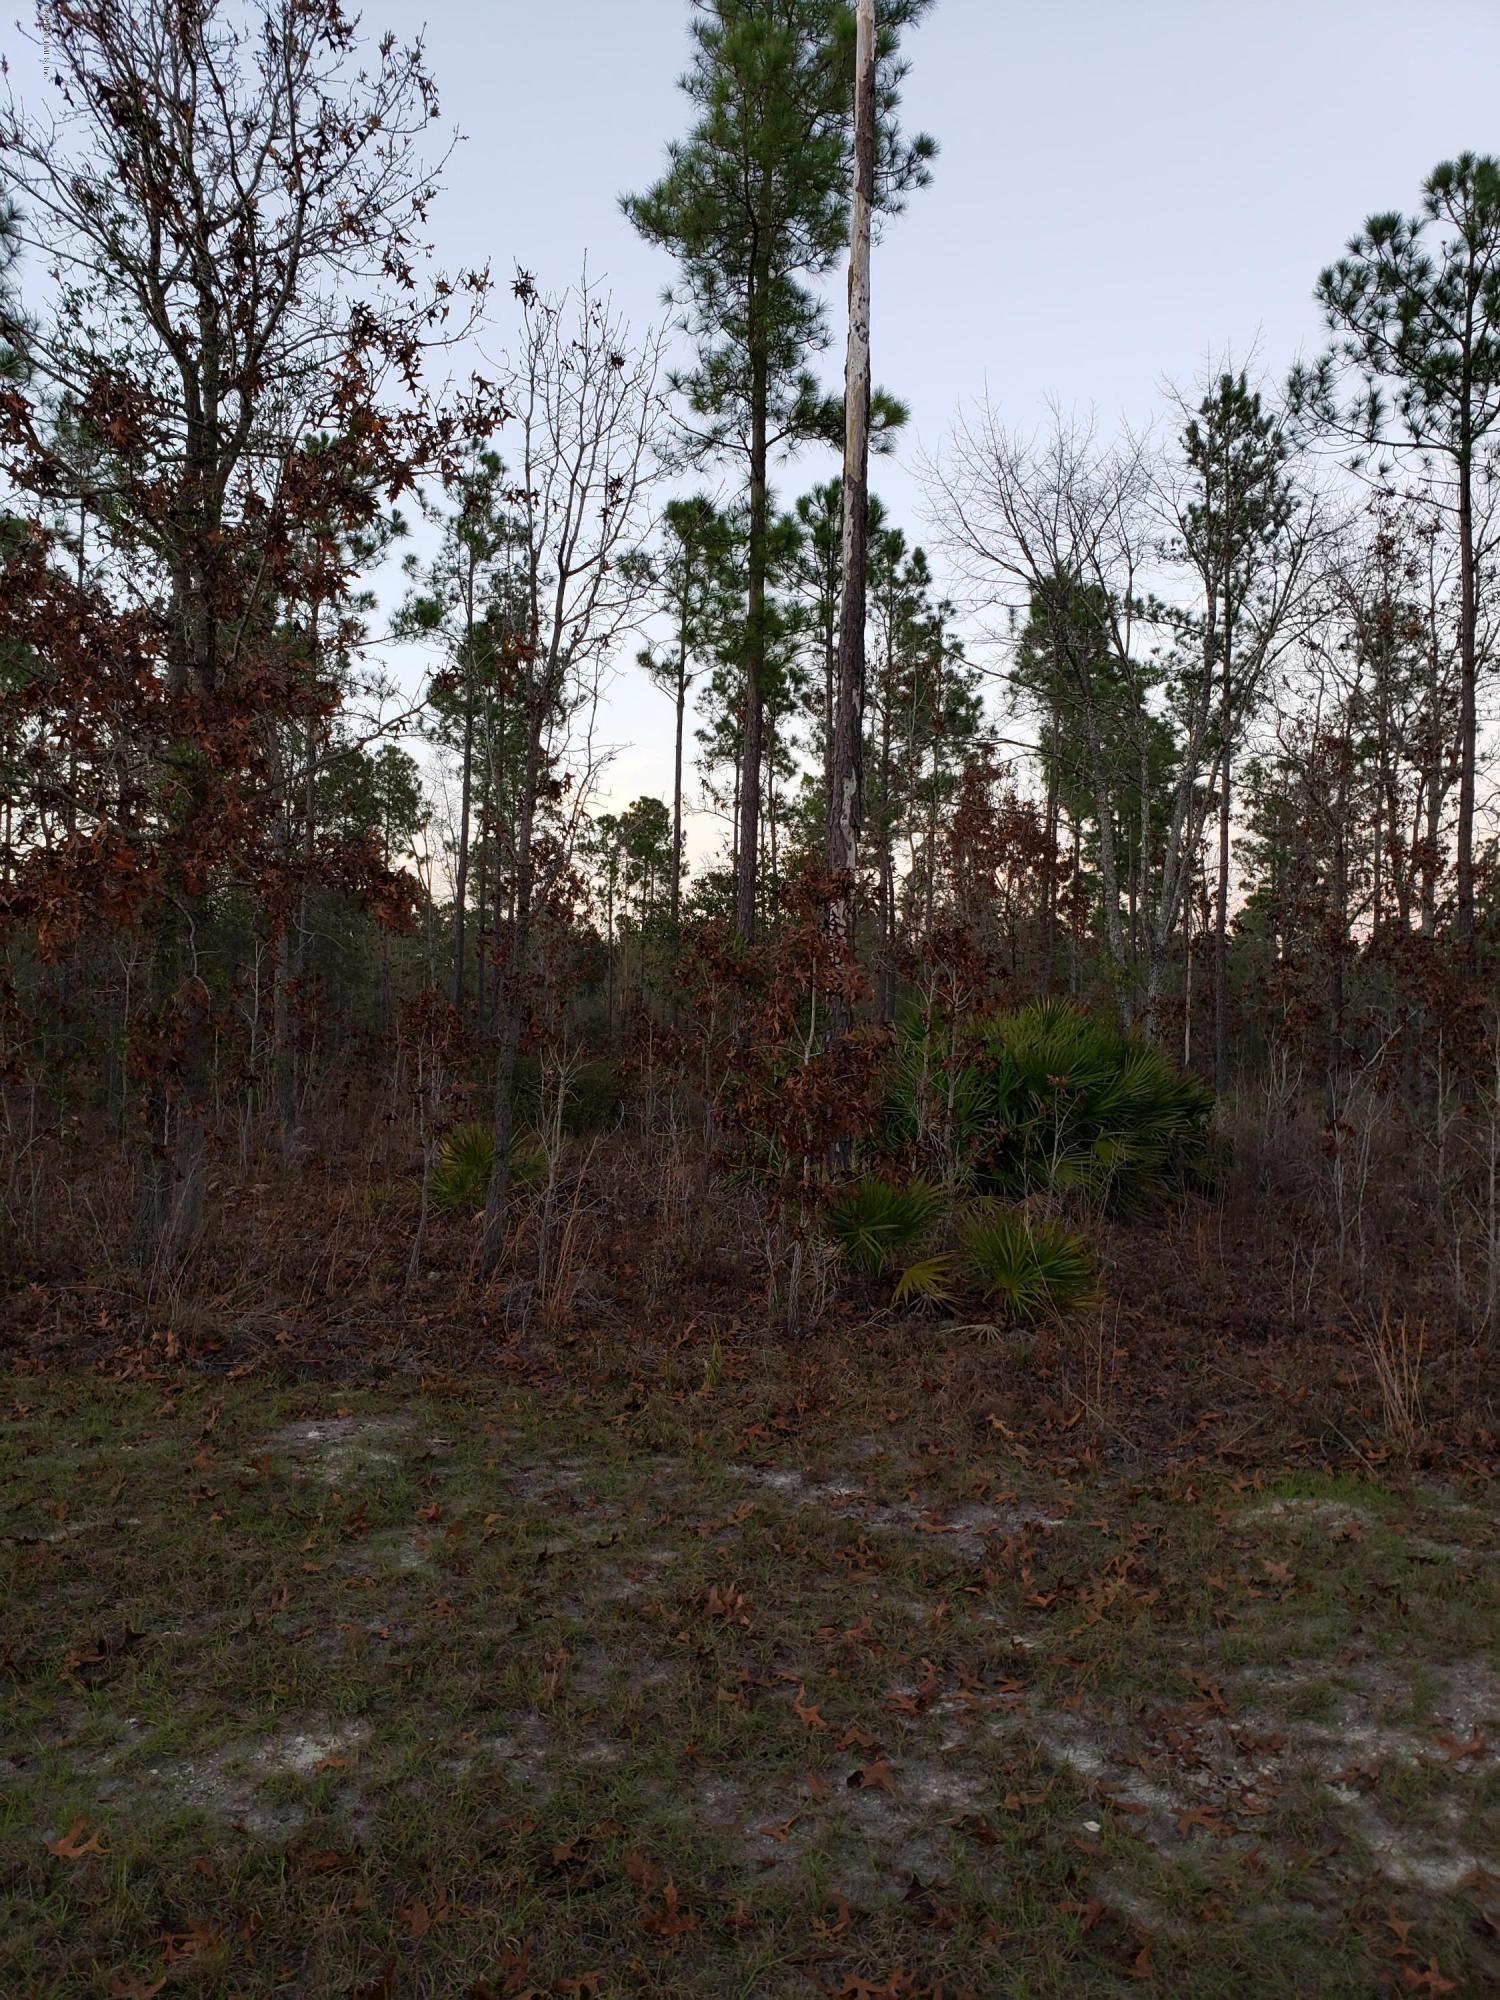 0 DEEP CREEK, BRYCEVILLE, FLORIDA 32009, ,Vacant land,For sale,DEEP CREEK,1031169